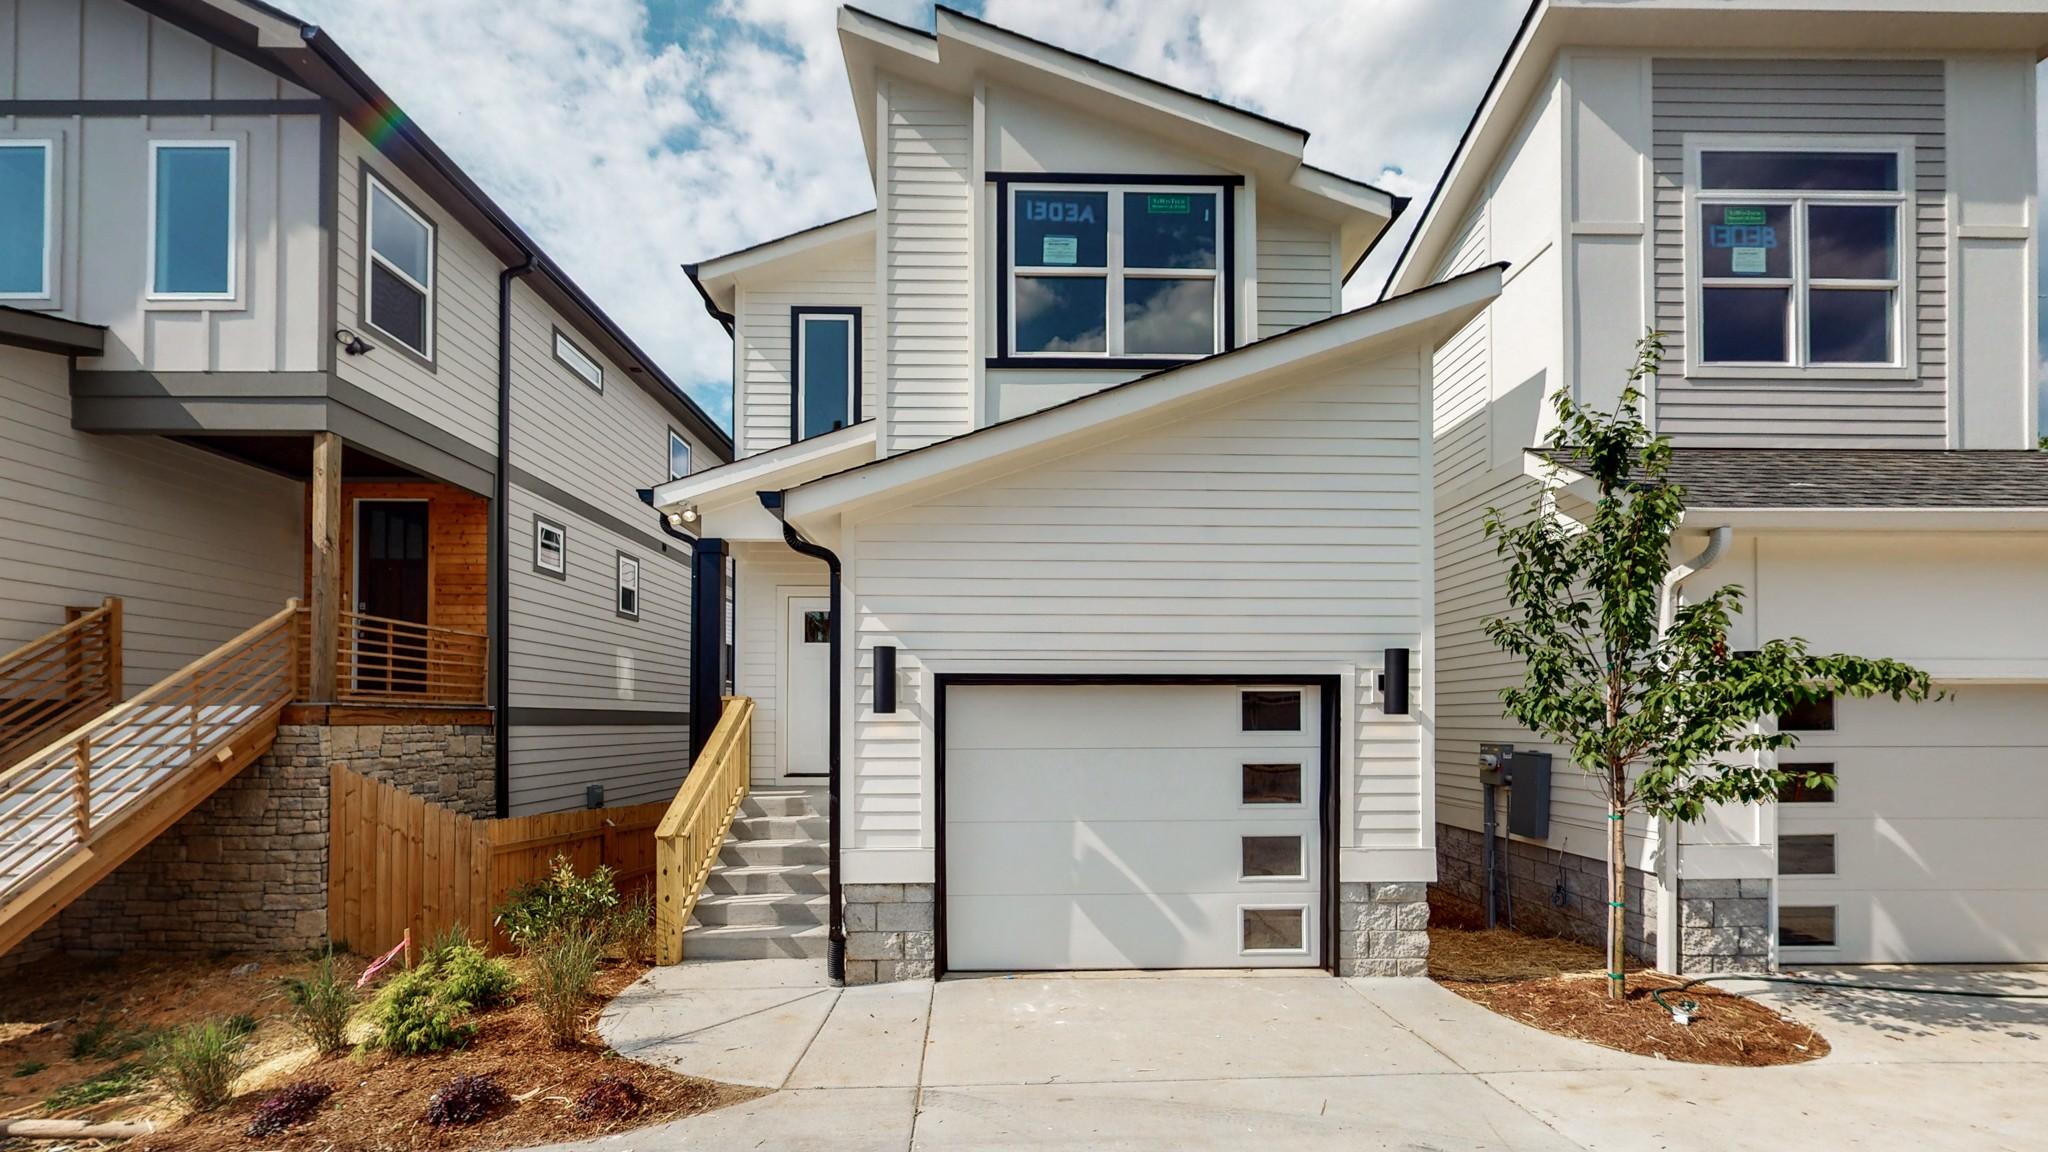 1303A Litton Ave Property Photo - Nashville, TN real estate listing